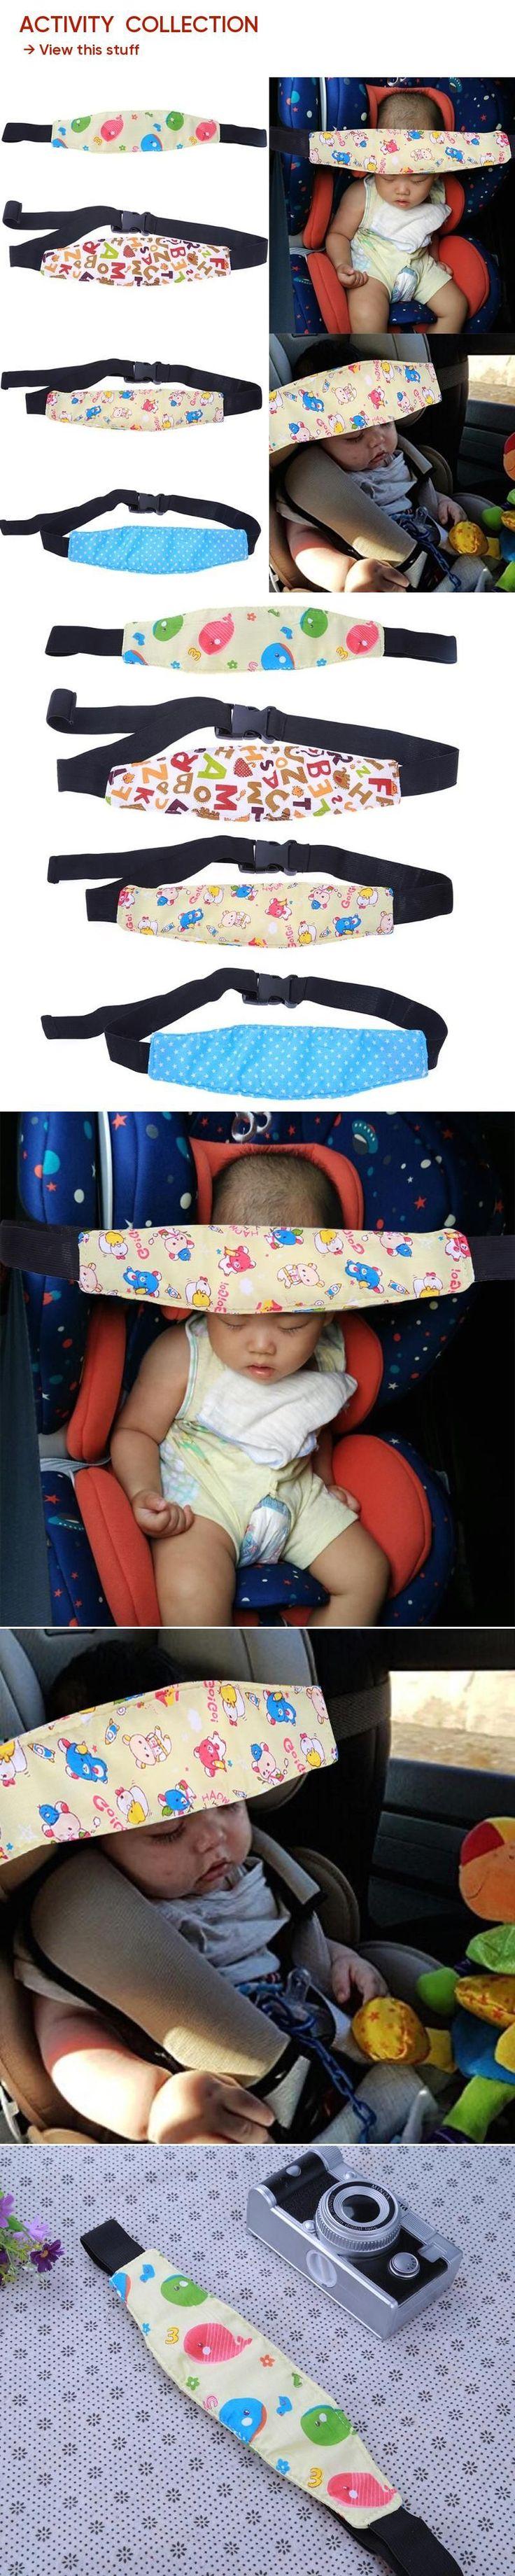 Adjustable Safety Baby Kid Car Seat Sleep Nap For Stroller